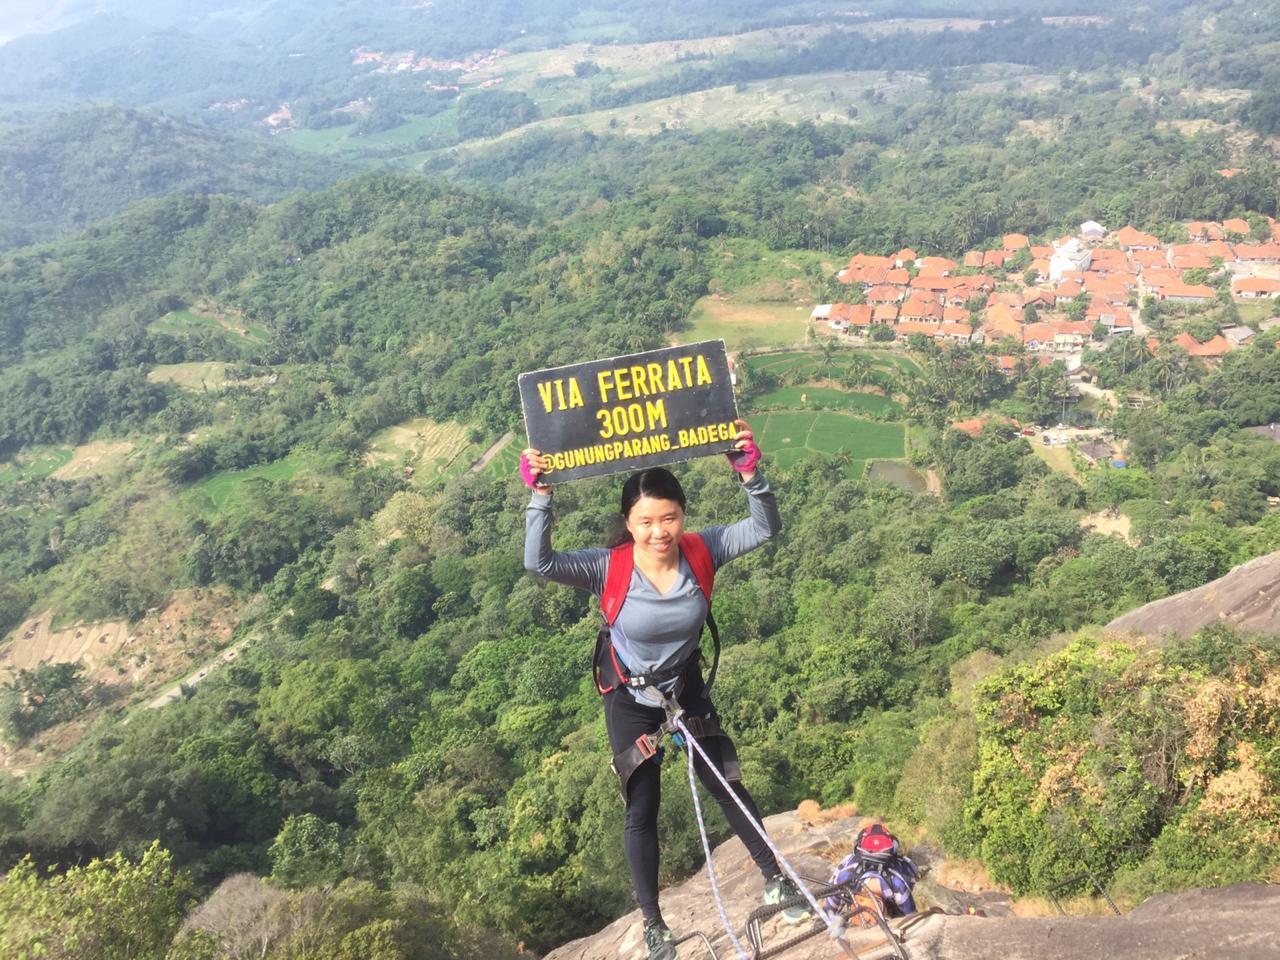 Wall Climbing Gunung Parang via Ferrata (Ind)